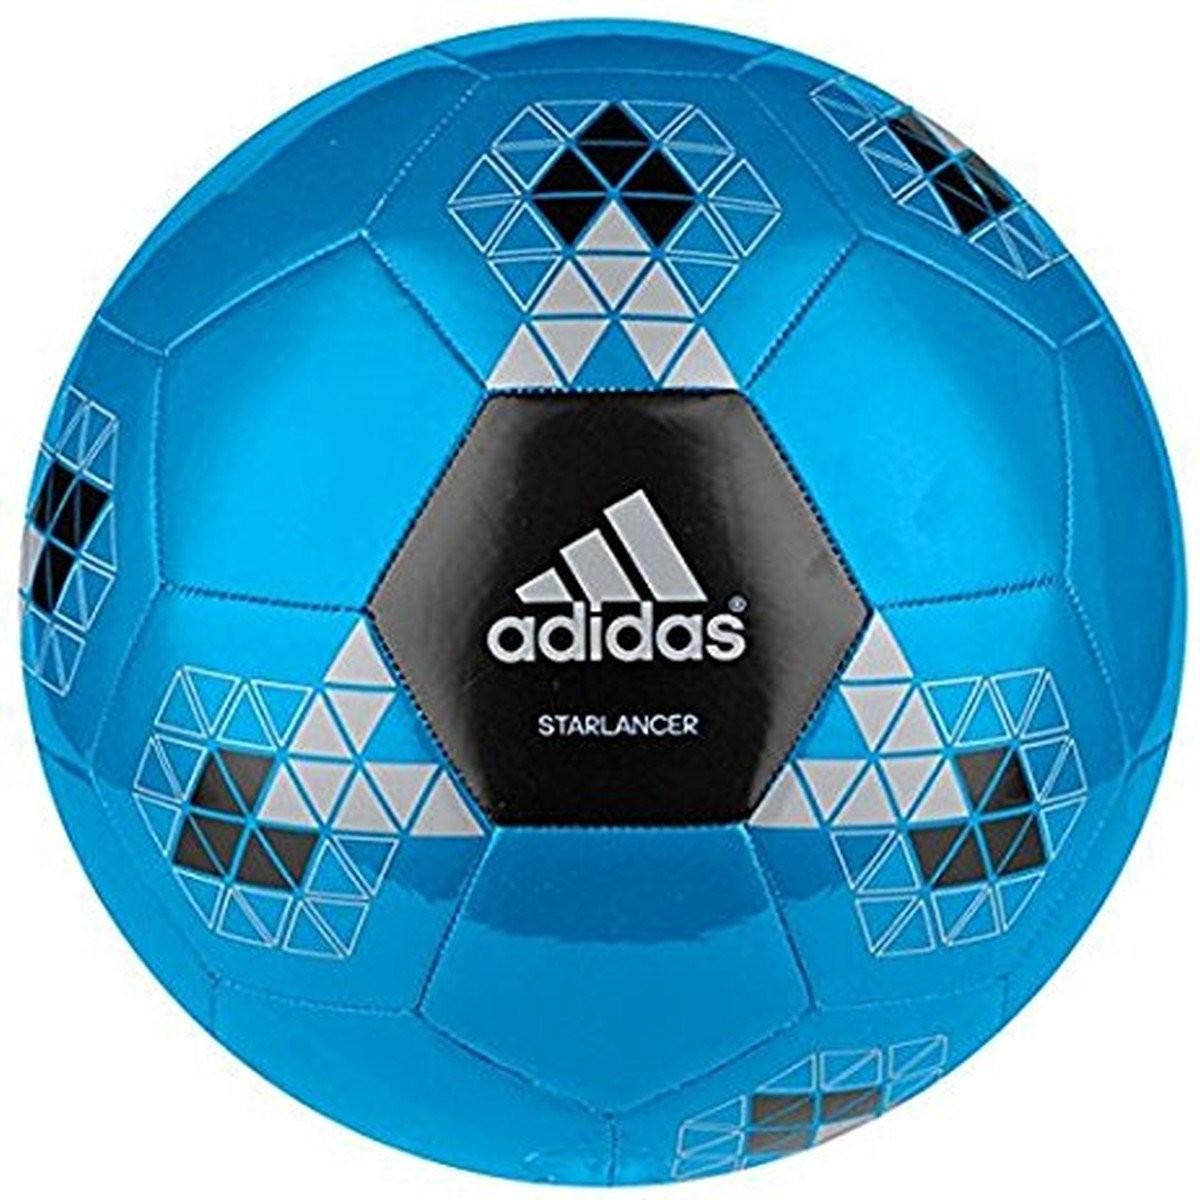 Adidas VS Piłka nożna, Starlancer, rozmiar 4